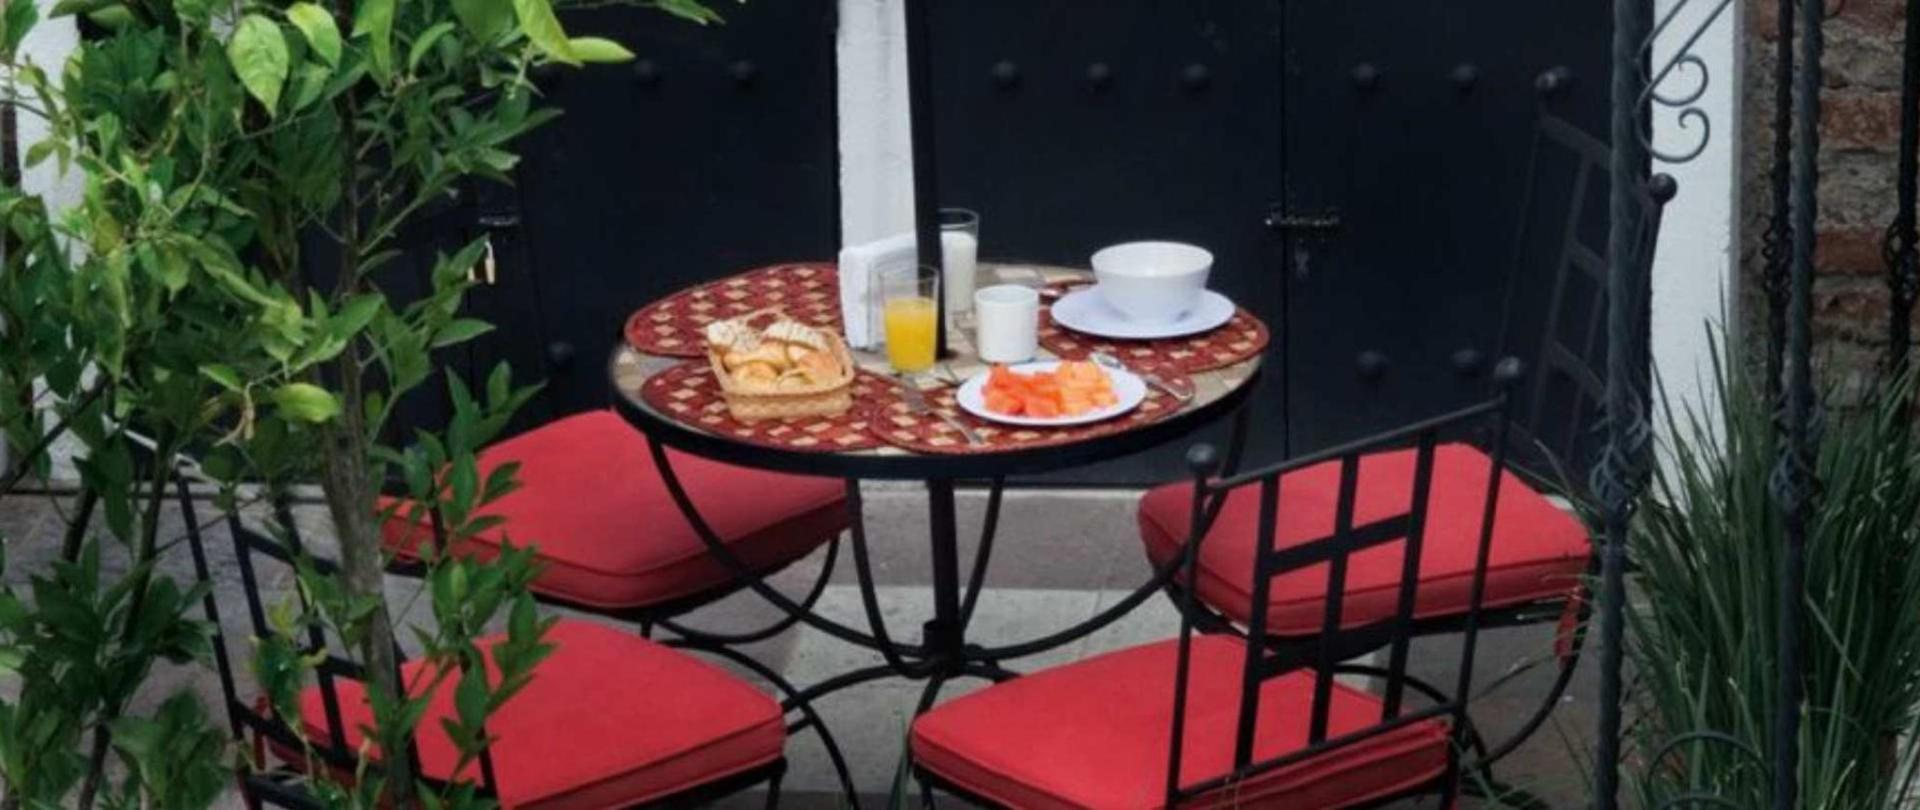 Breakfast -Hotel Quinta Lucca -Querétaro.jpg